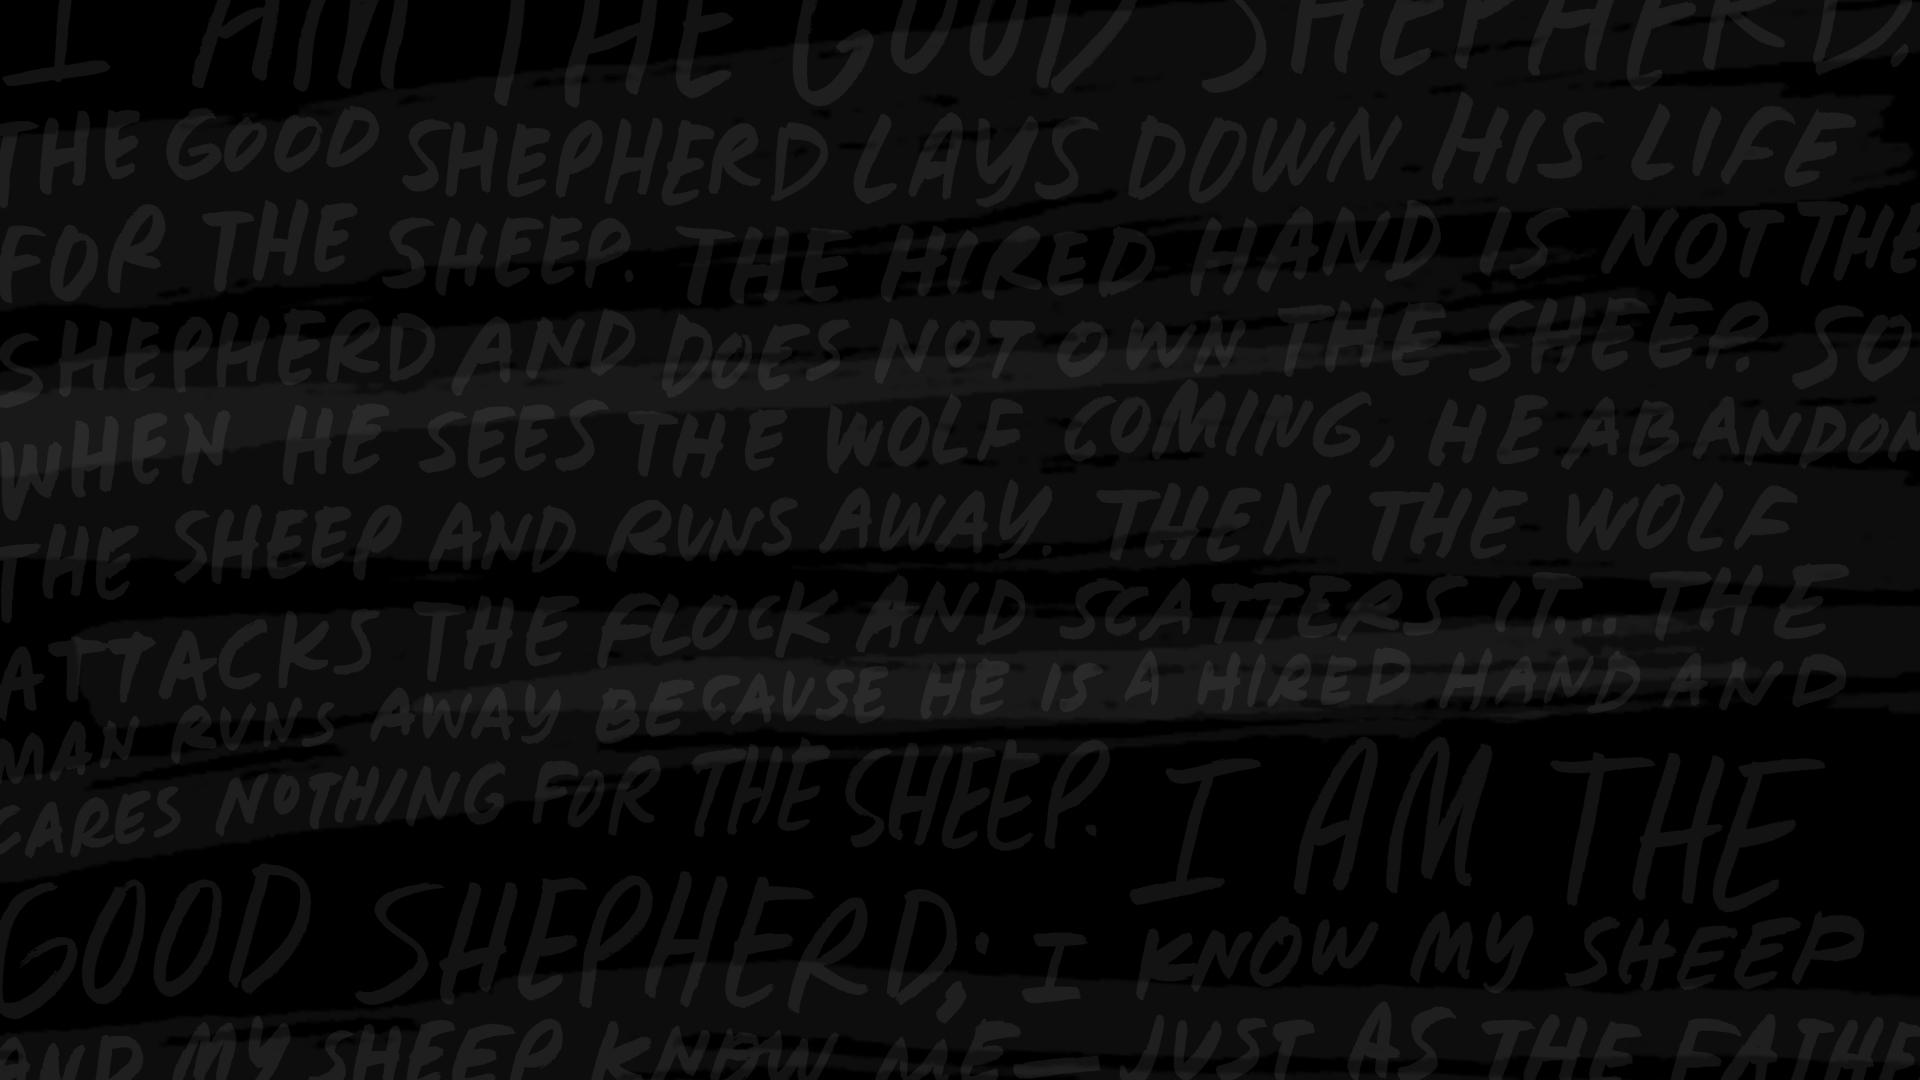 Good Shepherd (JPG)